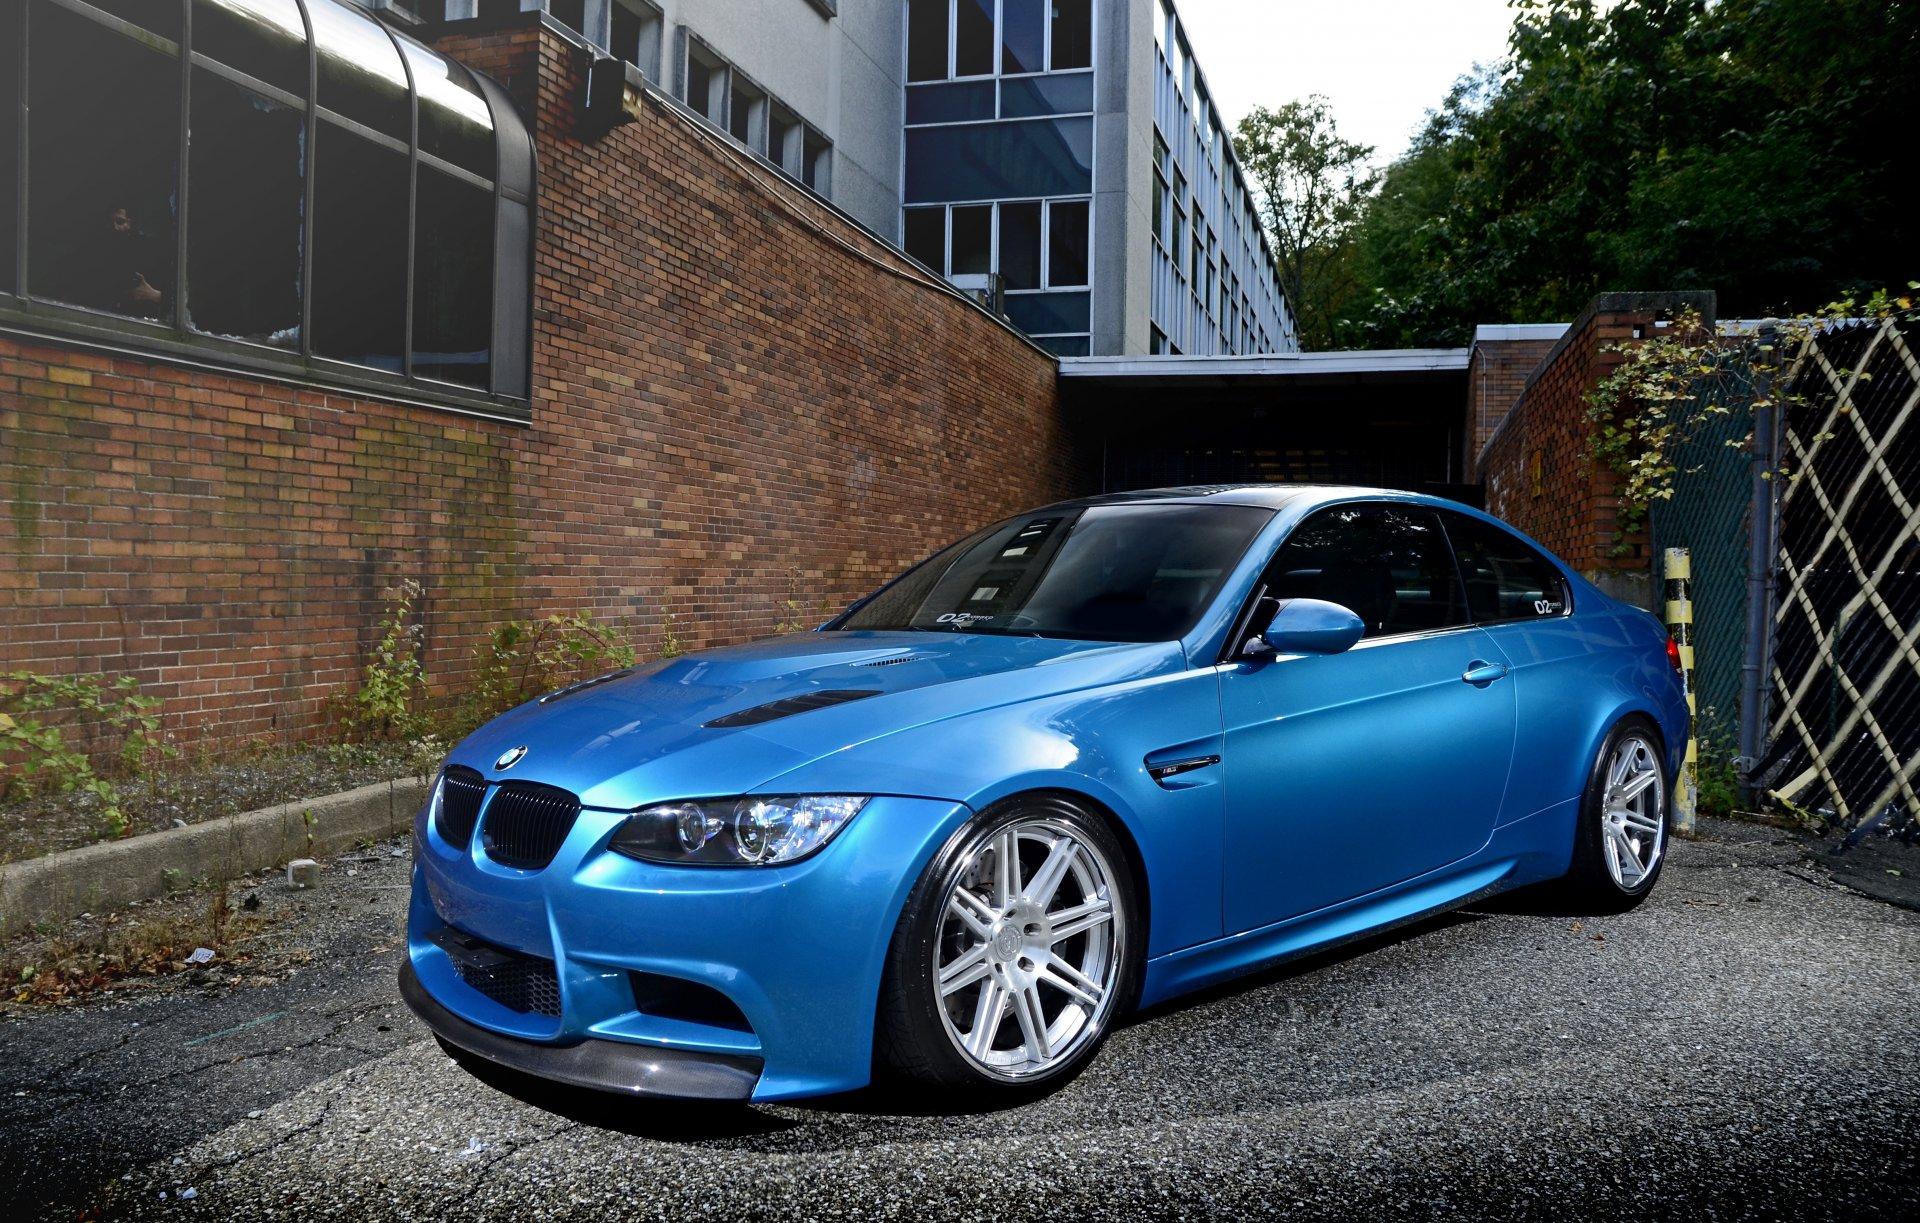 Обои Облака, синий, blue, Bmw, M3, задок. Автомобили foto 9